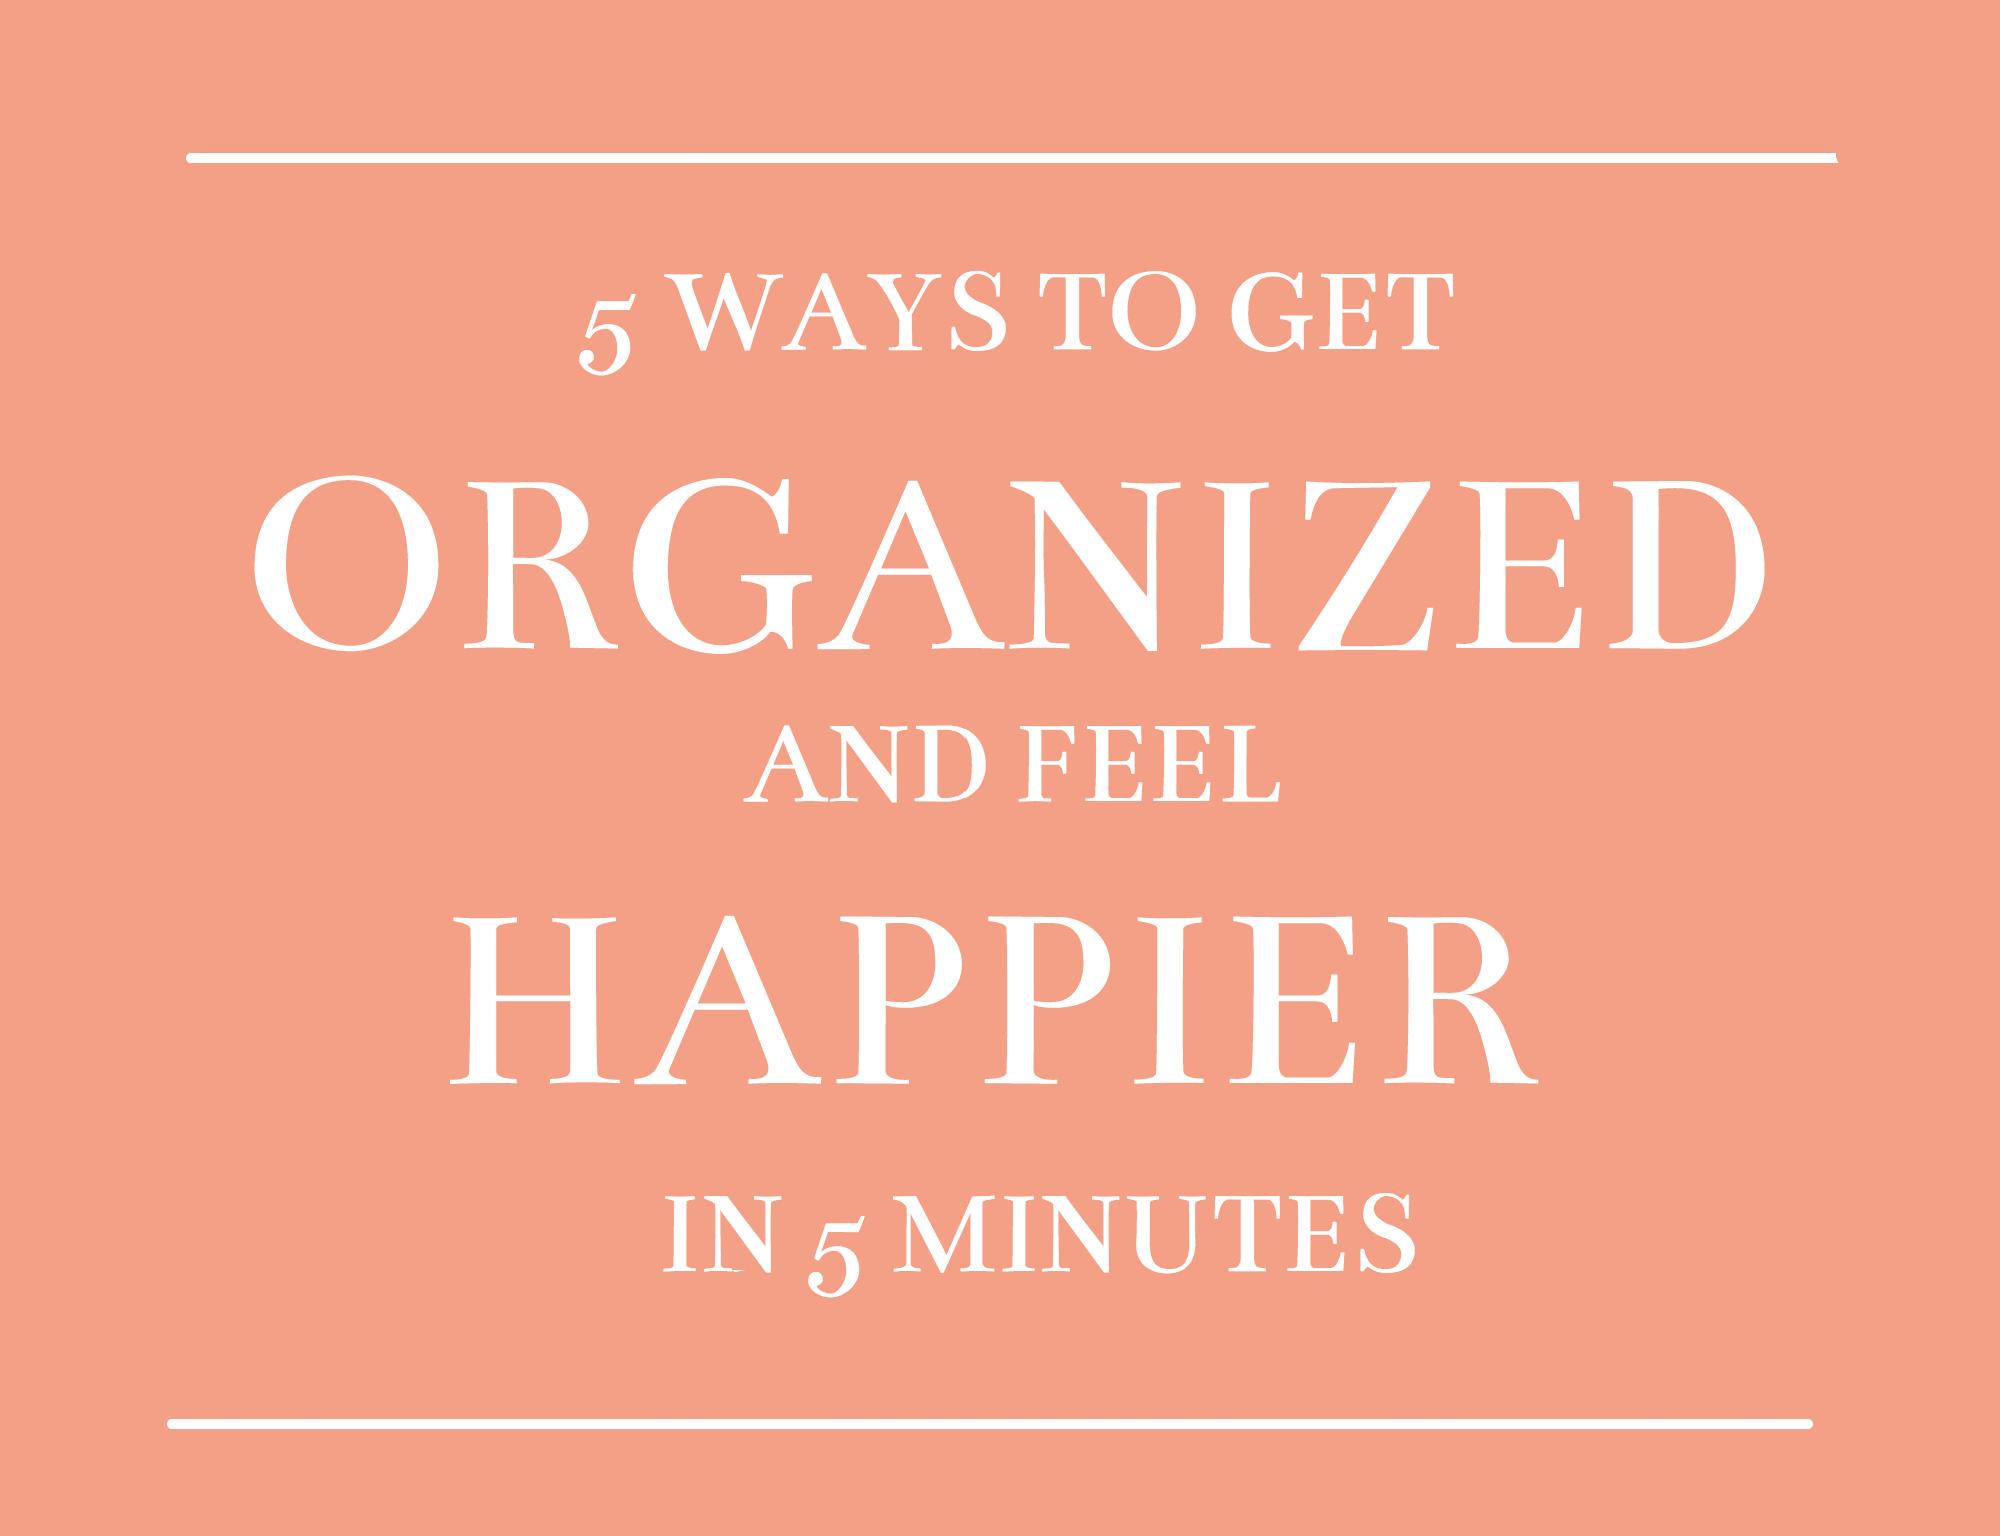 5 Ways to get Organized Sadie Road